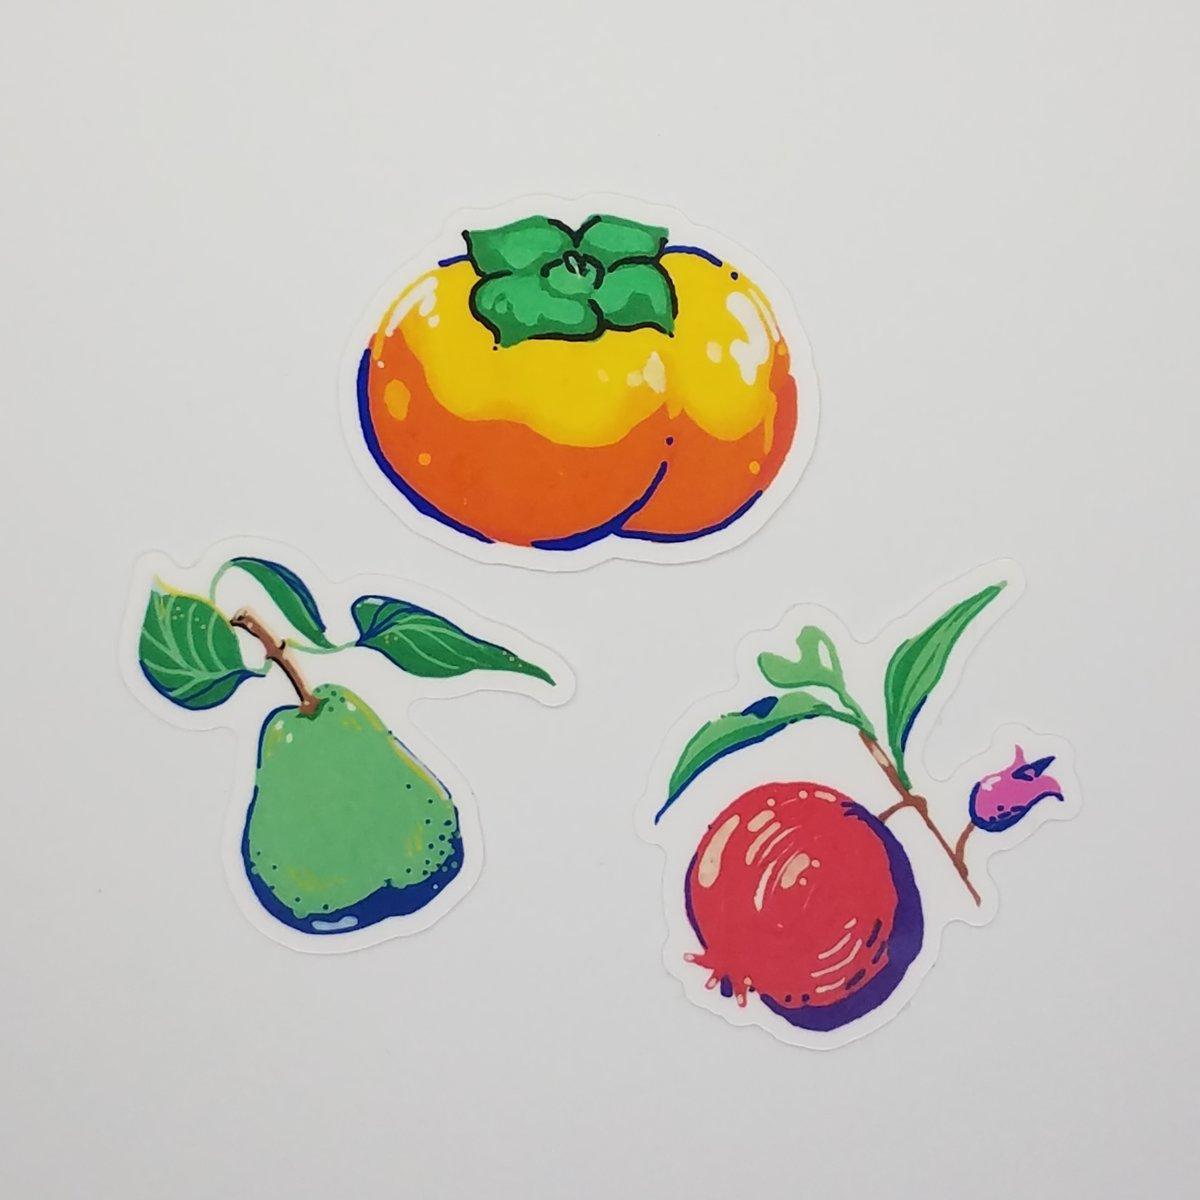 Image of Fruit vinyls